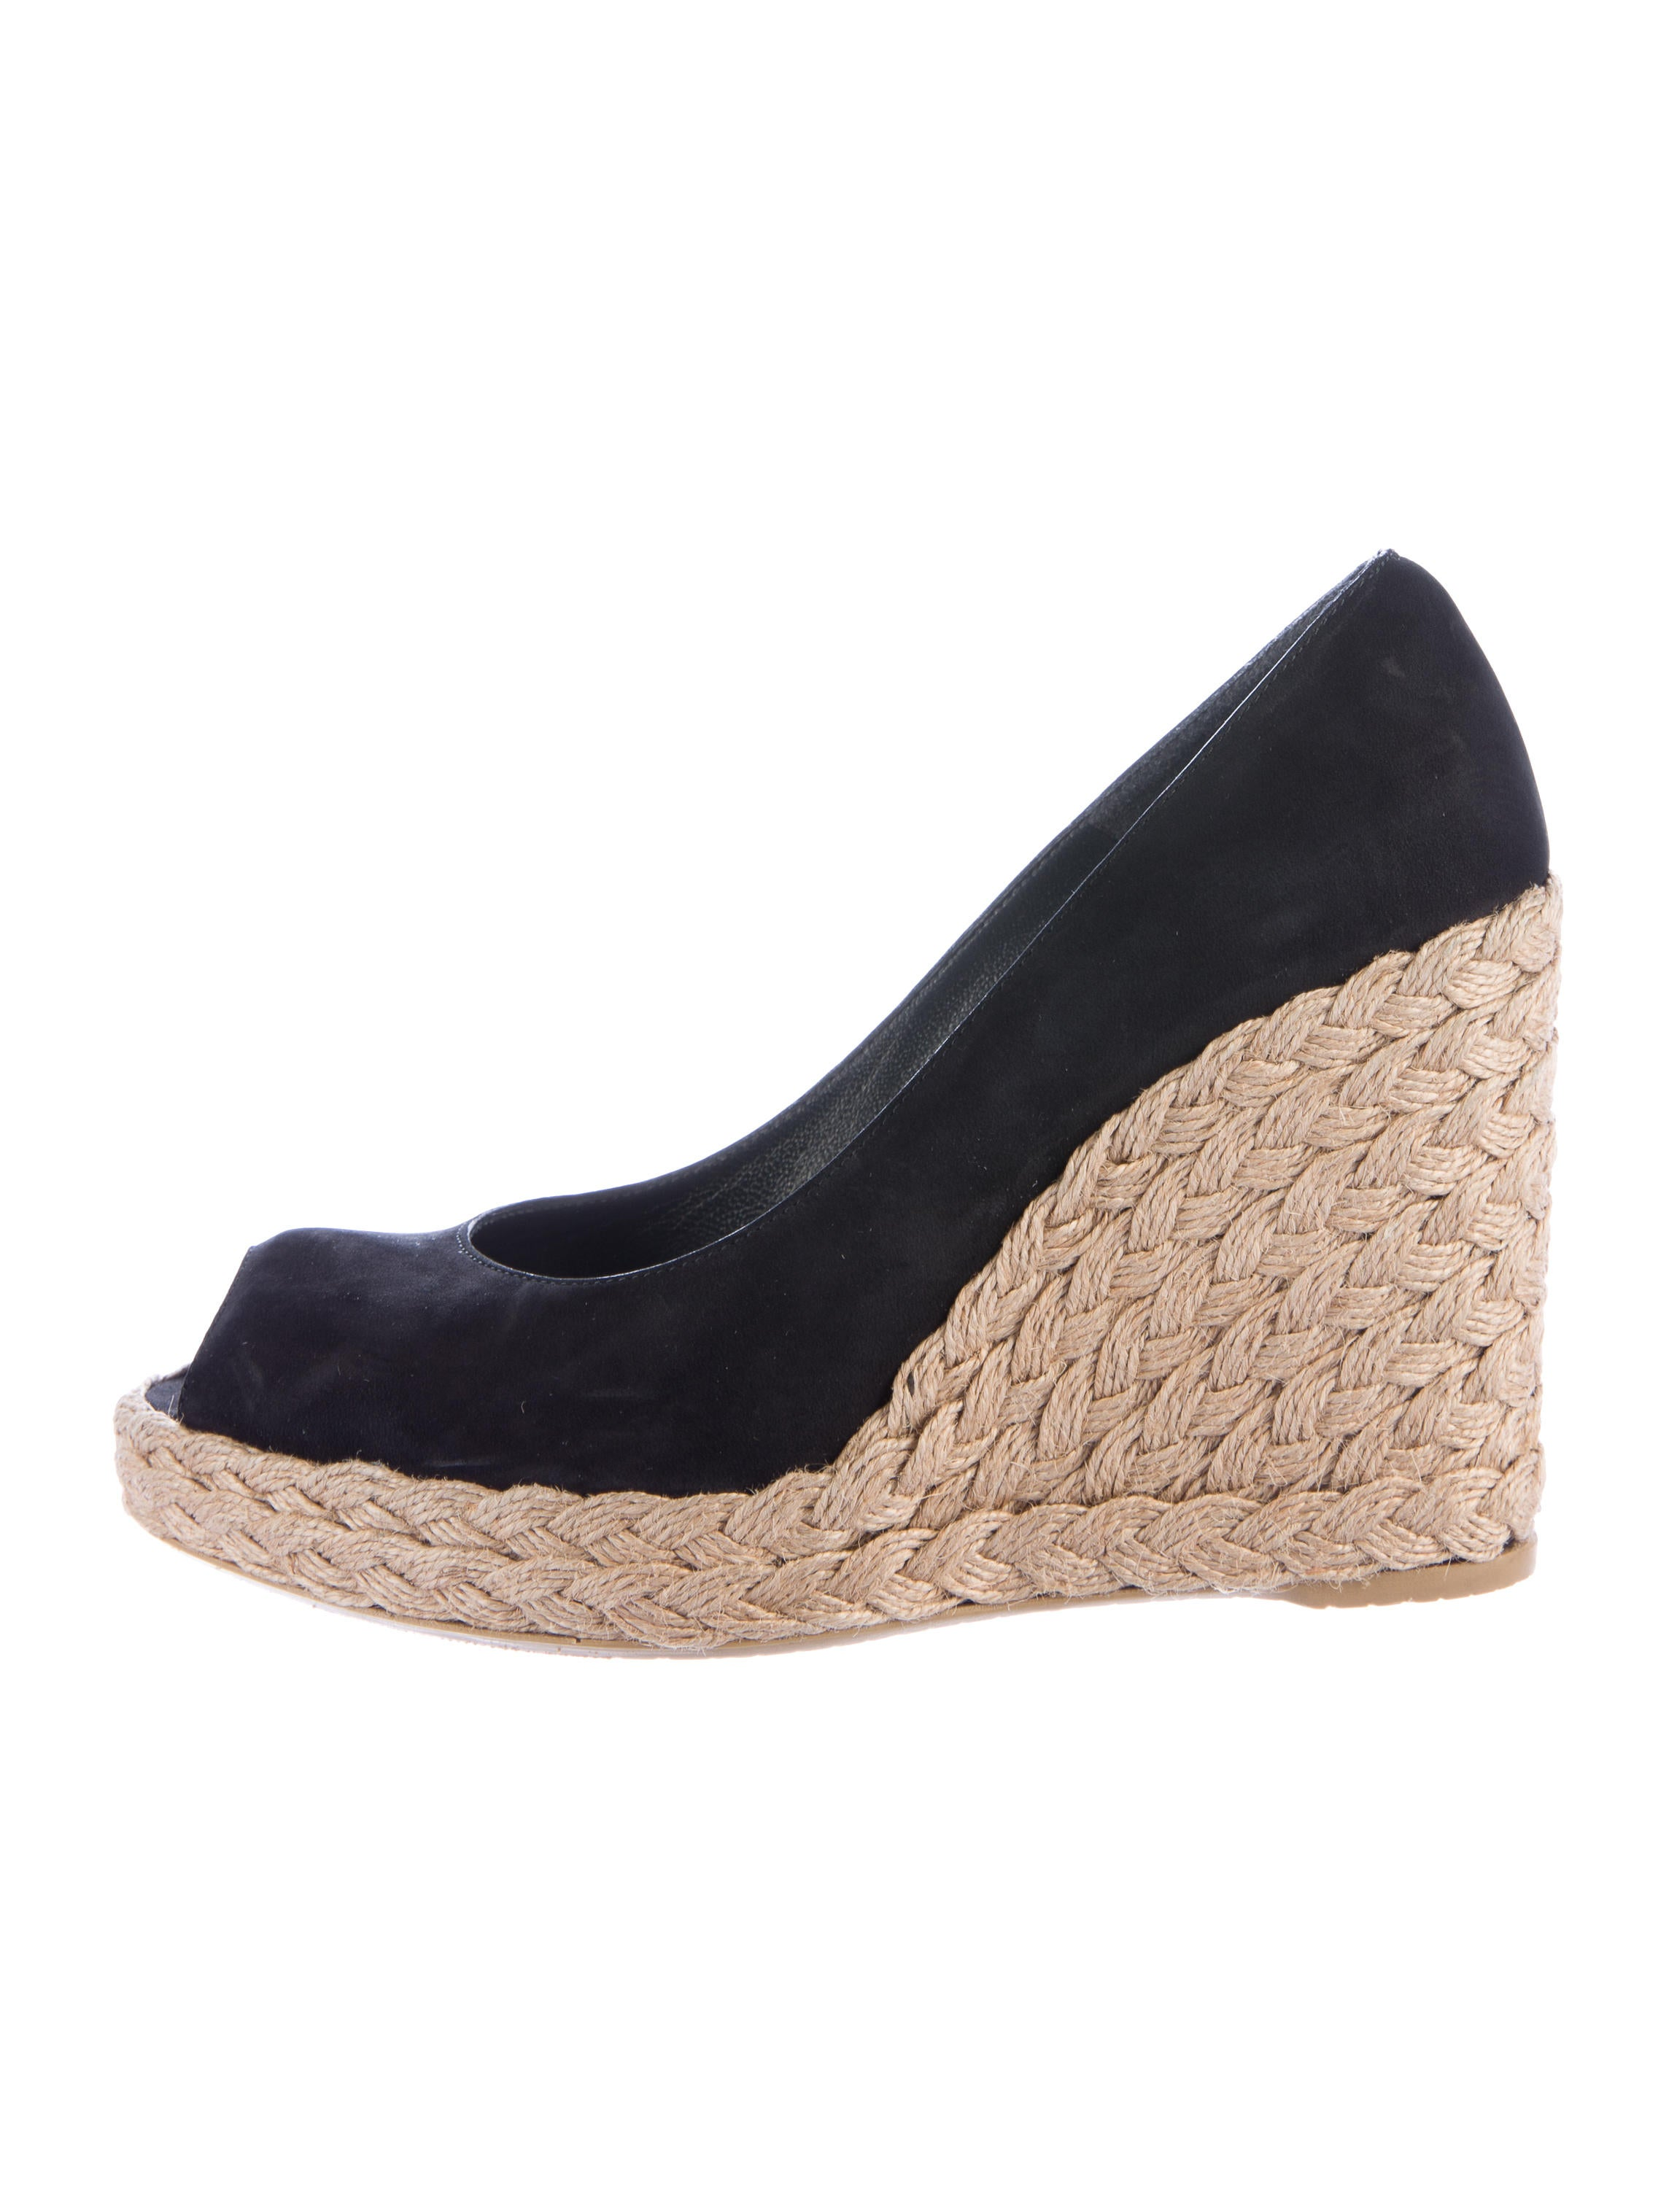 stuart weitzman peep toe espadrille wedges shoes